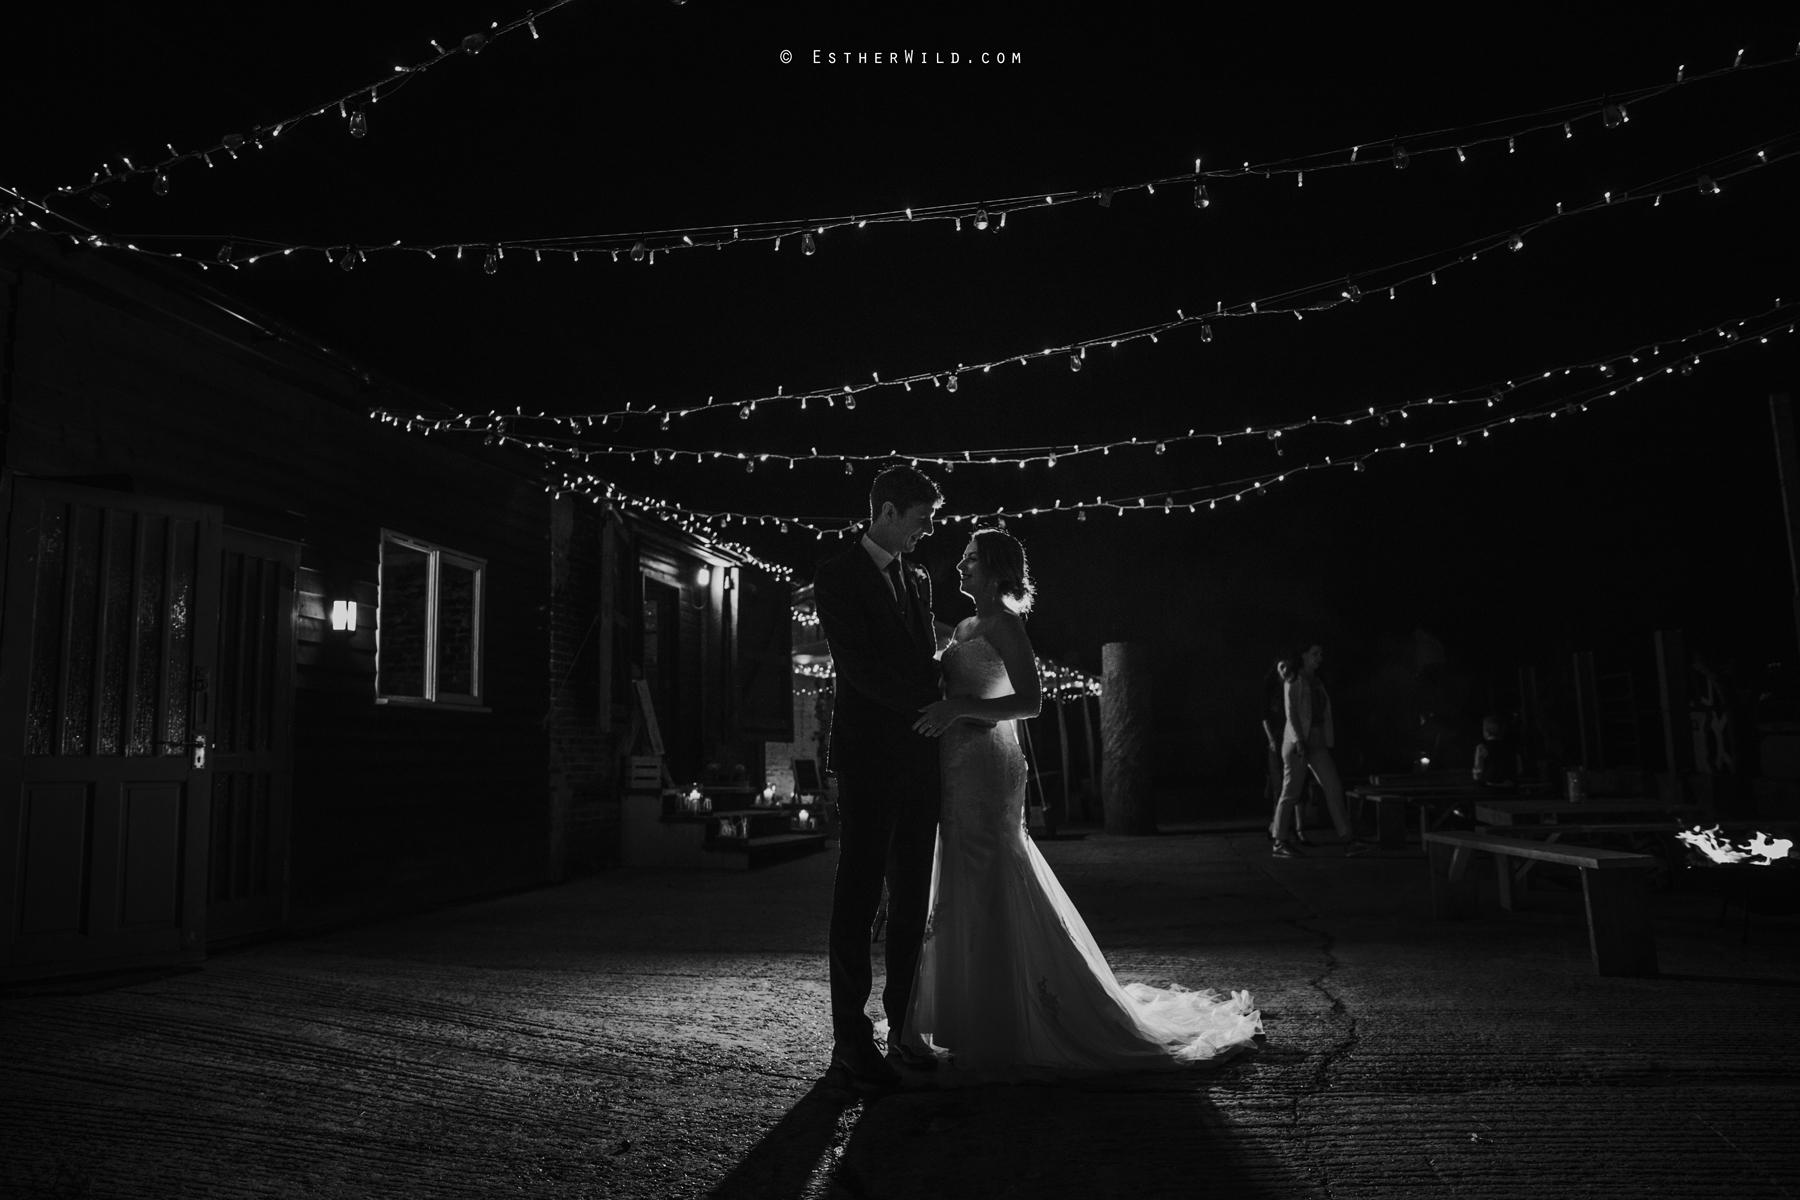 Glebe_Farm_Barn_Rustic_Norfolk_Wedding_Esther_Wild_Photographer_Copyright_IMG_3264-2.jpg